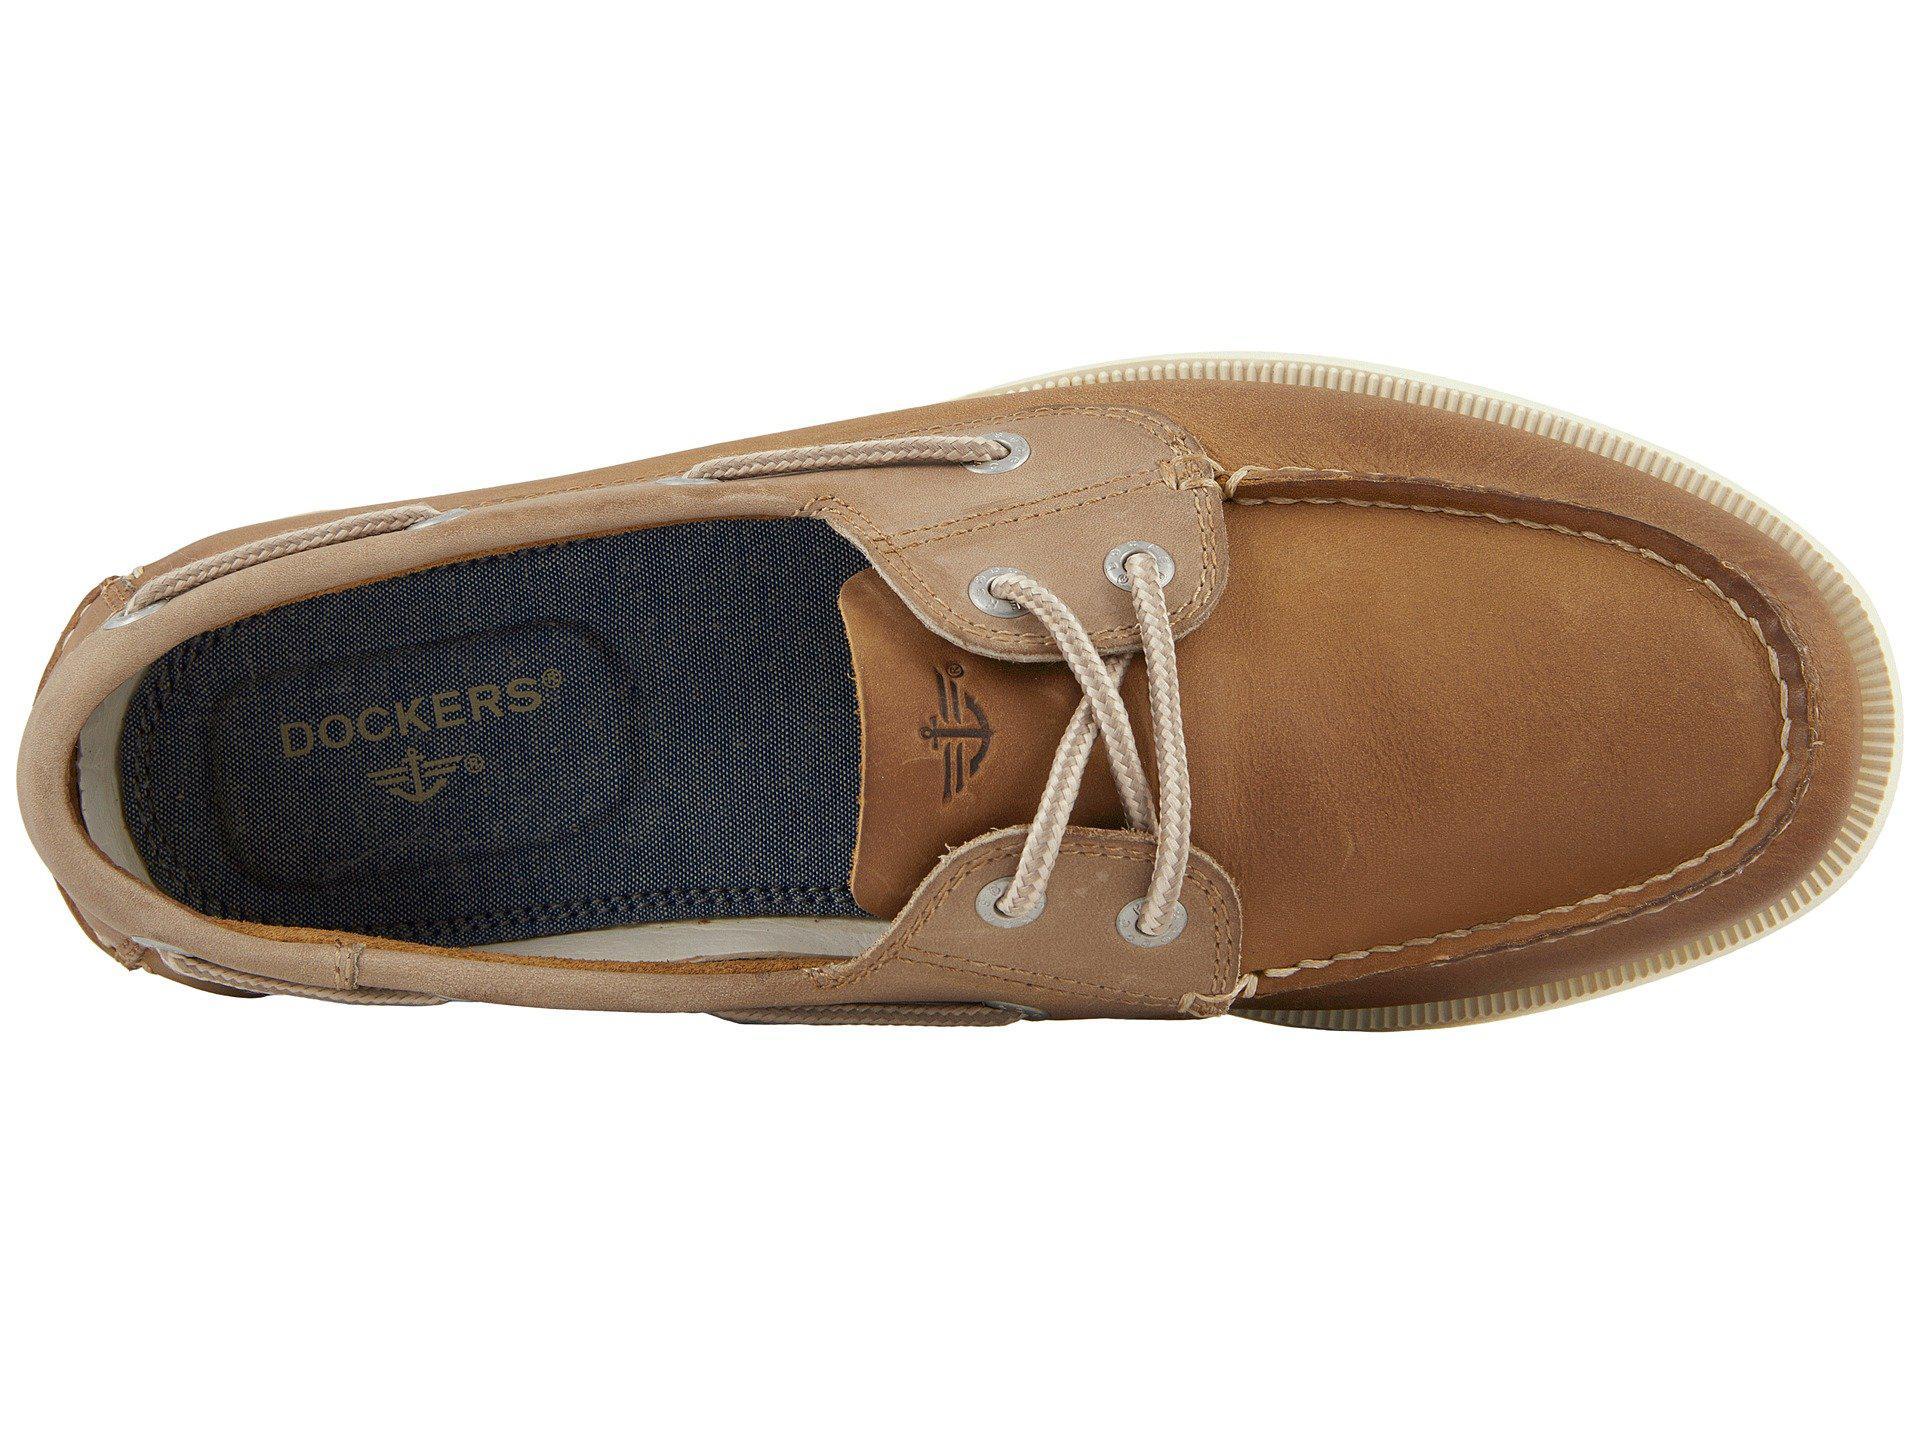 204e7f5778f Dockers - Multicolor Vargas Boat Shoe for Men - Lyst. View fullscreen